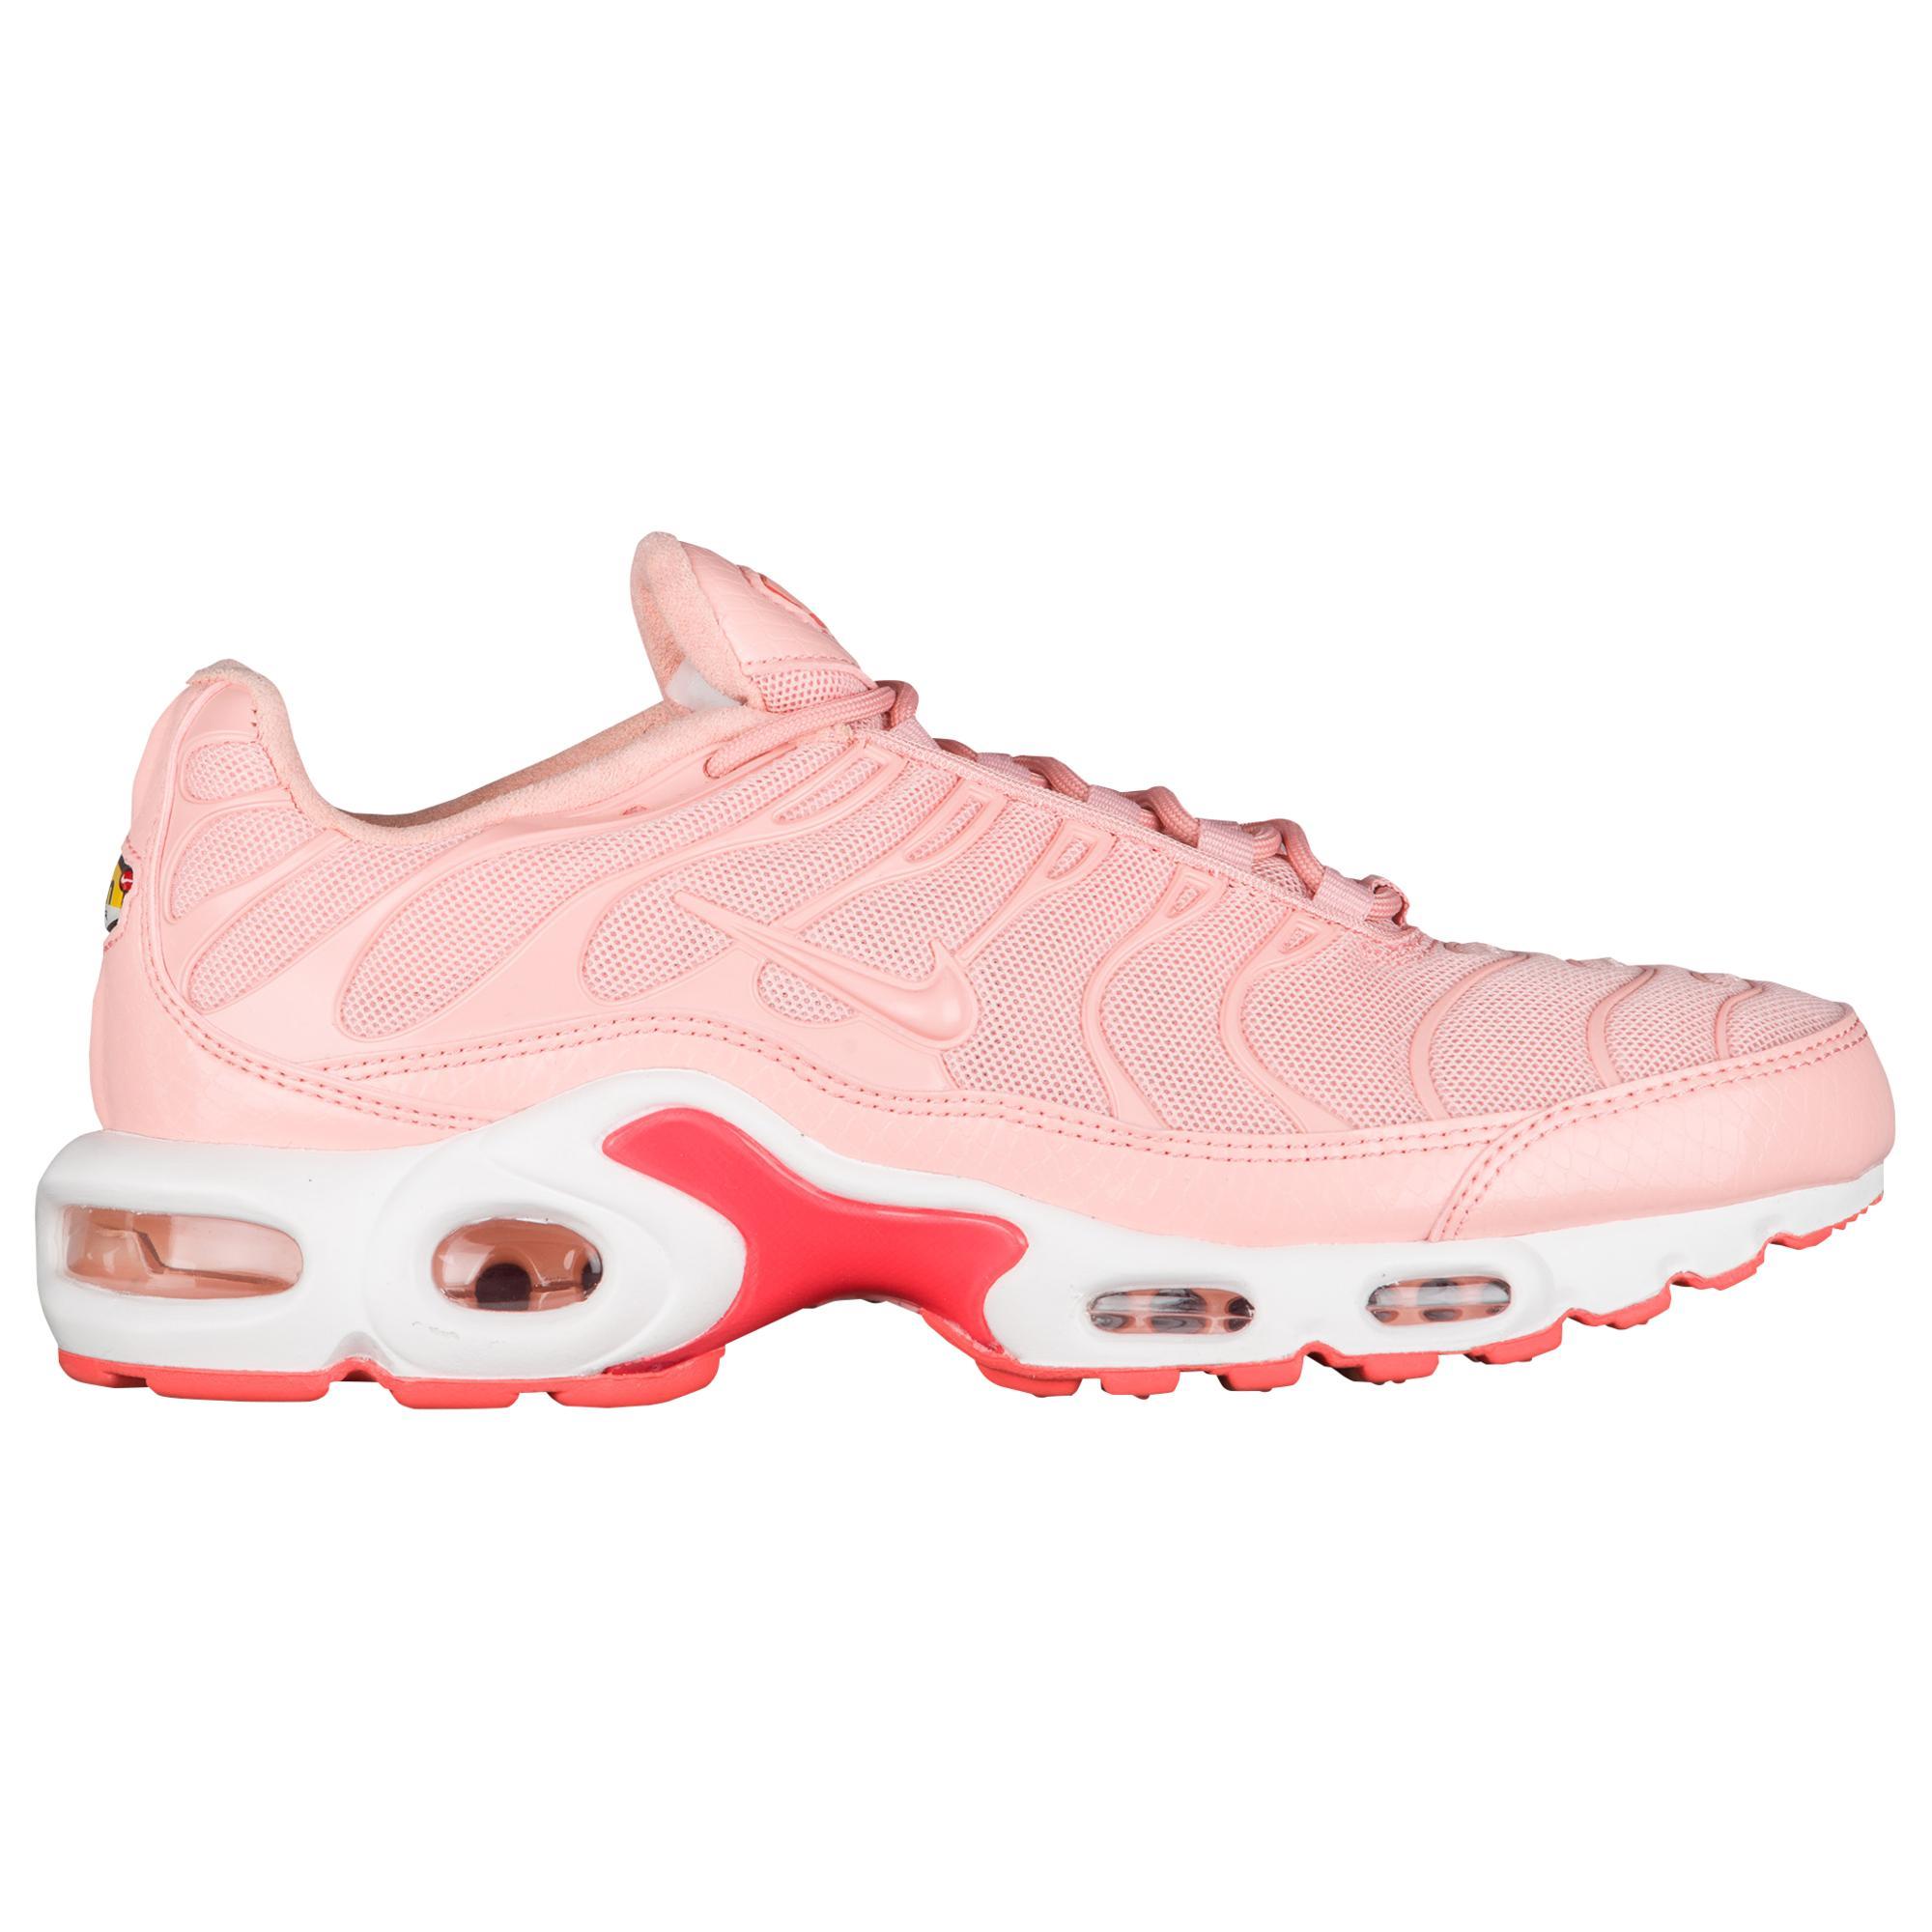 nike air max plus womens pink